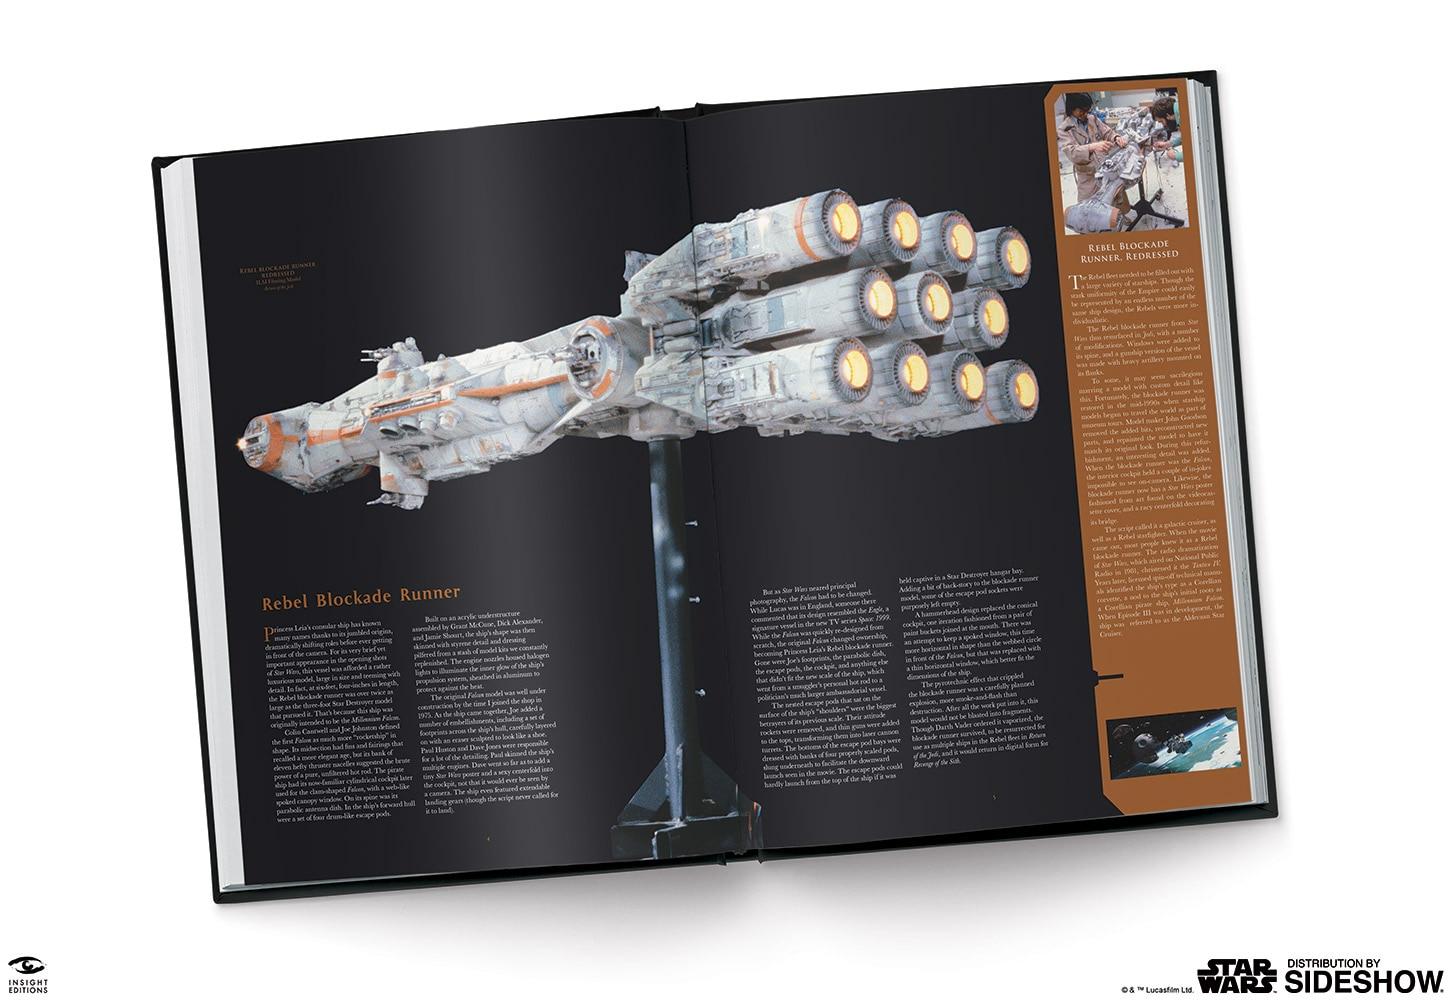 Sculpting-a-galaxy-inside-the-star-wars-model-shop-06